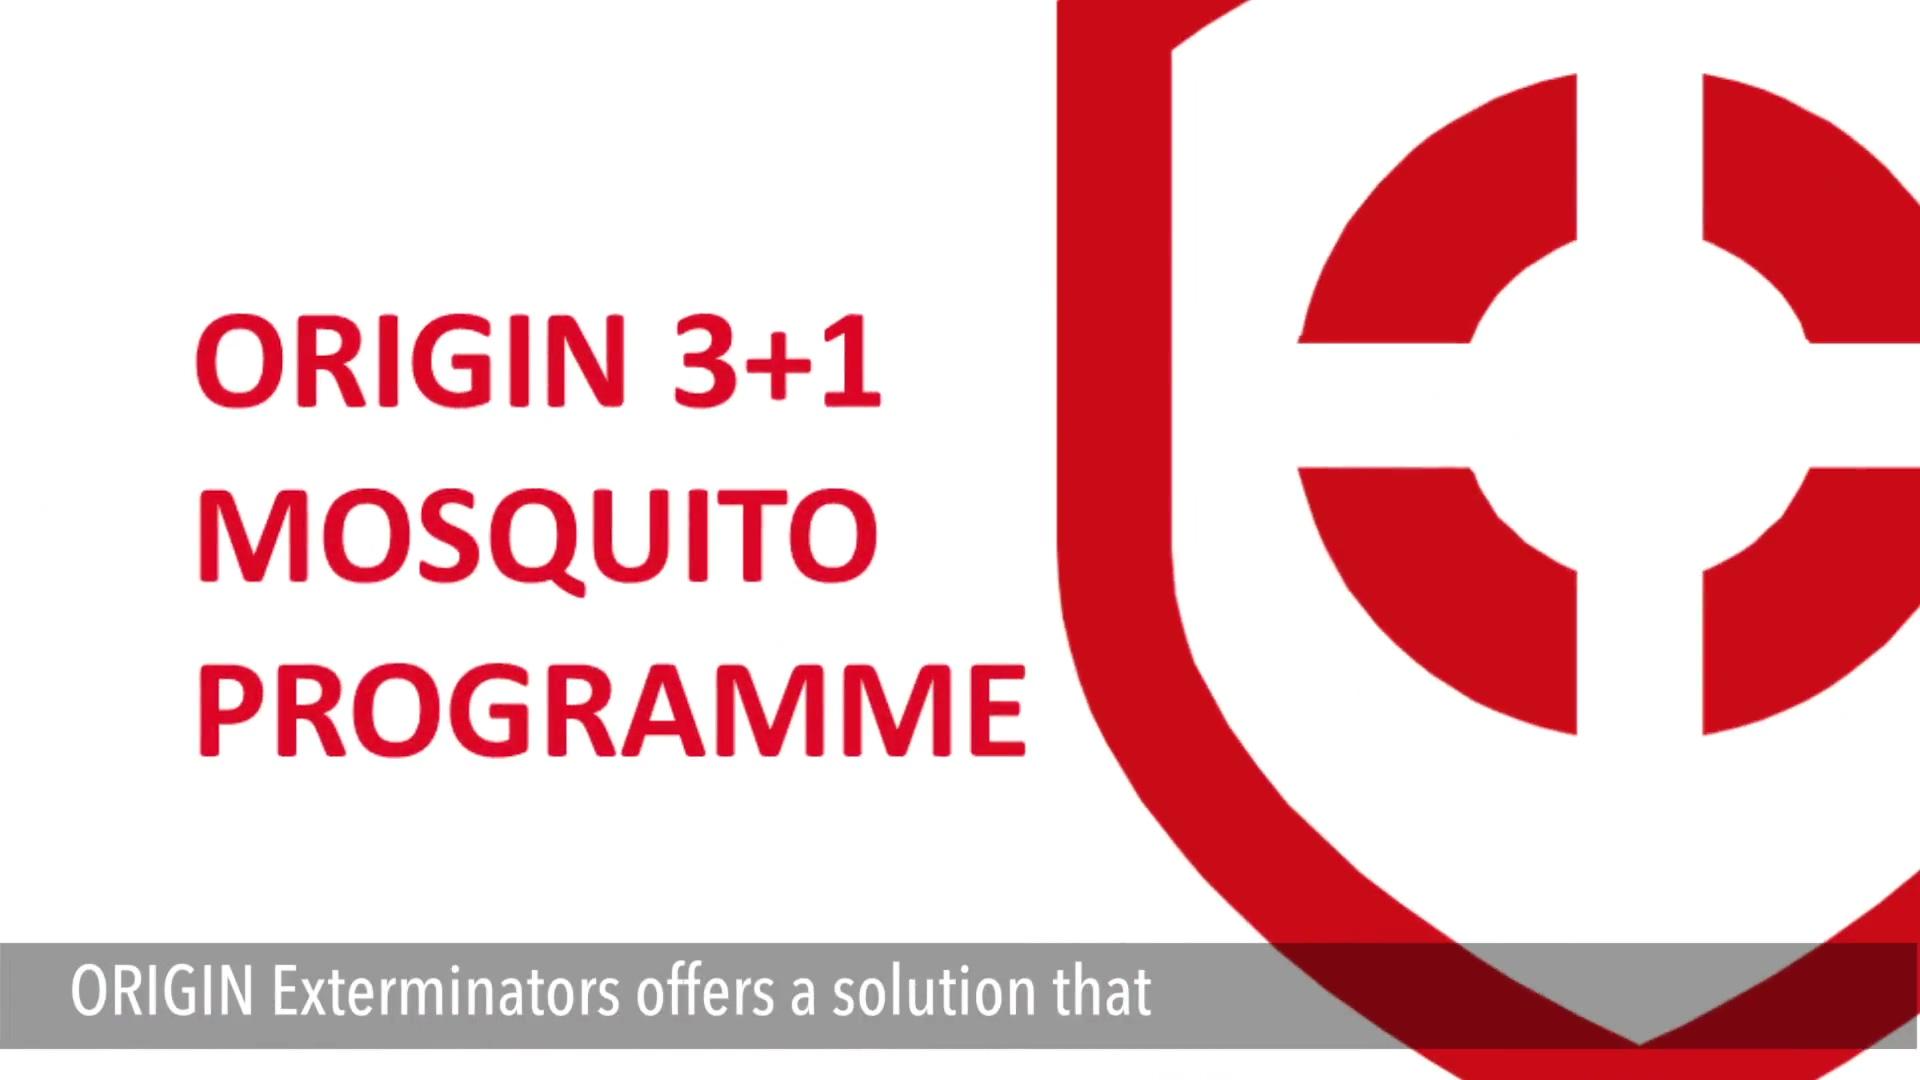 ORIGIN 3+1 Mosquito Programme